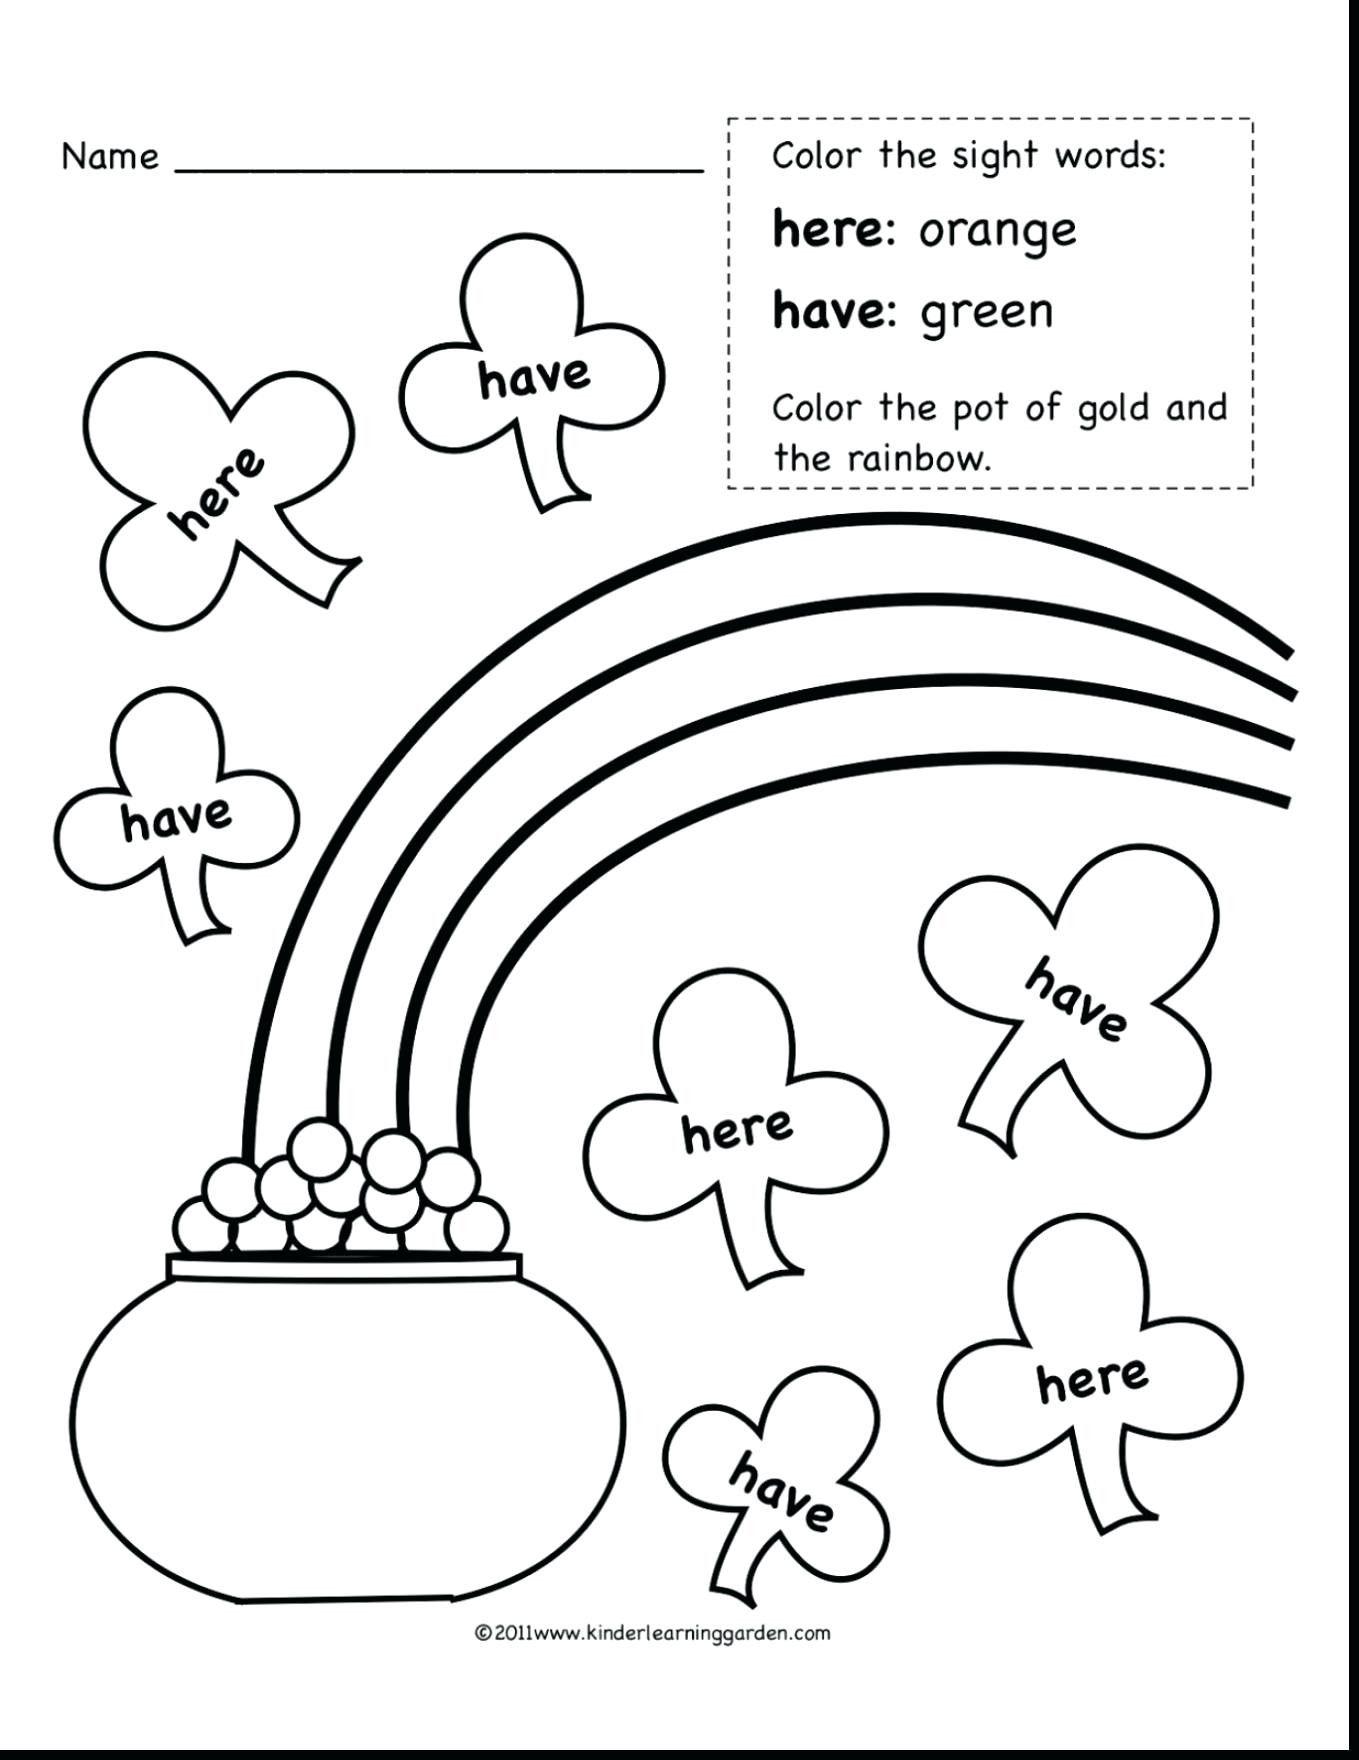 Spider Worksheet For Kindergarten Worksheet For Kindergarten Sight Word Coloring Sight Words Kindergarten Rainbow Writing [ 1760 x 1359 Pixel ]